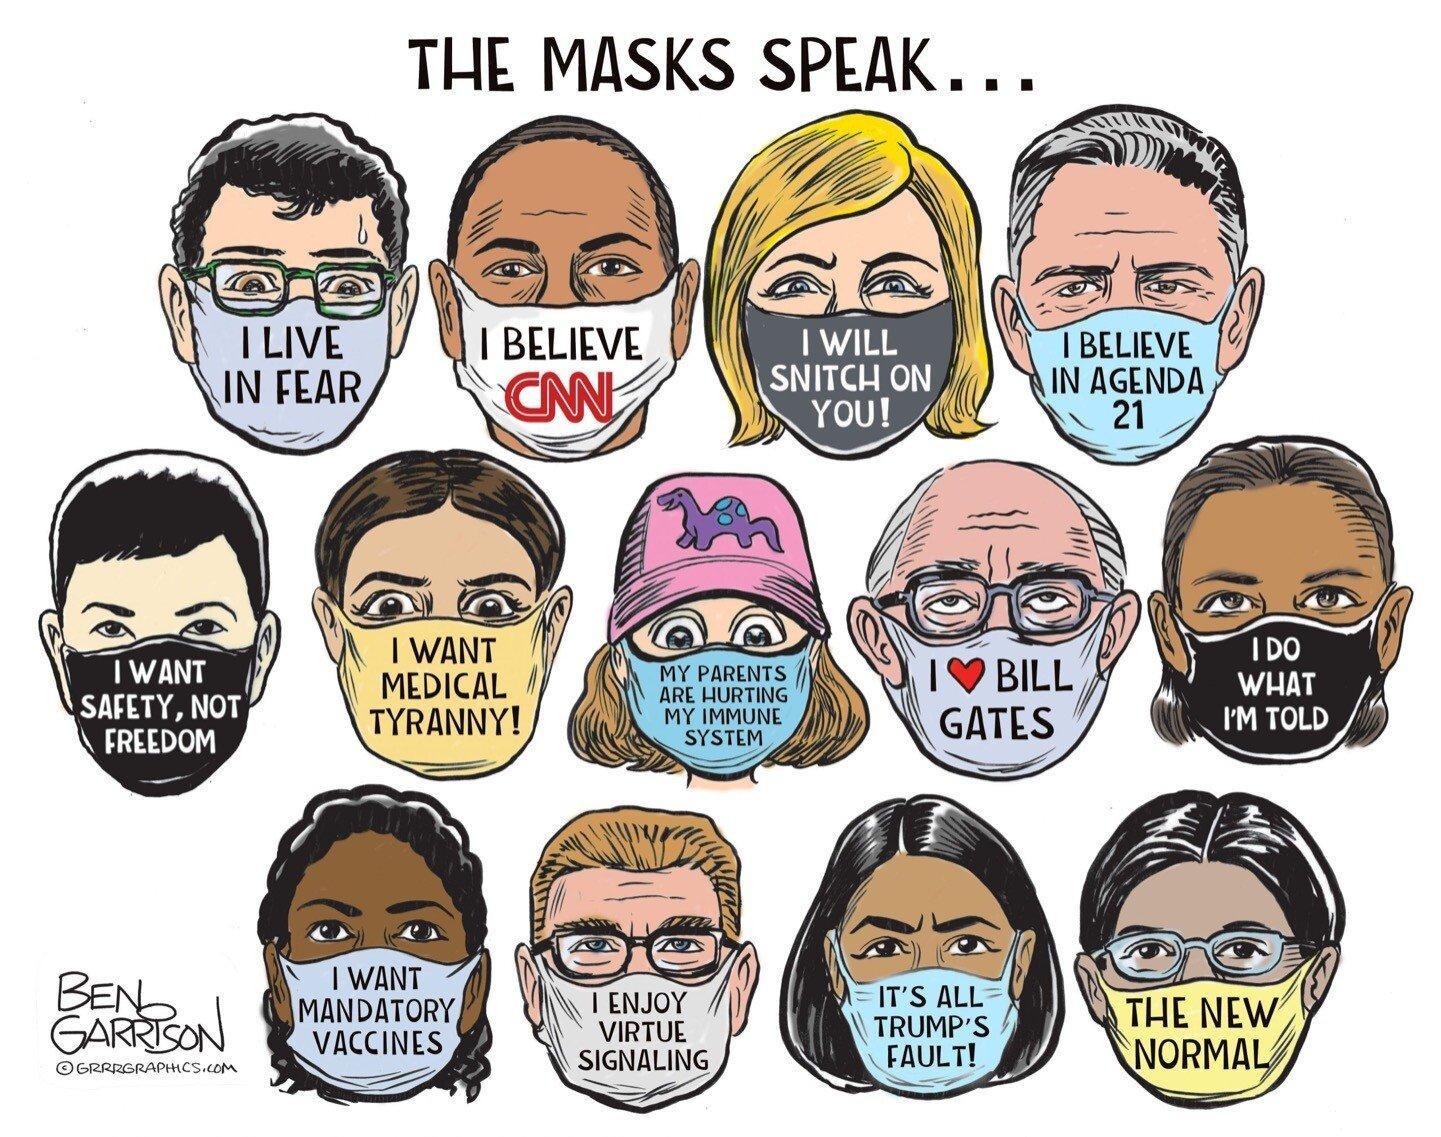 Meat Puppet Biden's '100 Days' Of Masks Transforms Into Masks 'Through The Next Year' (summit.news)